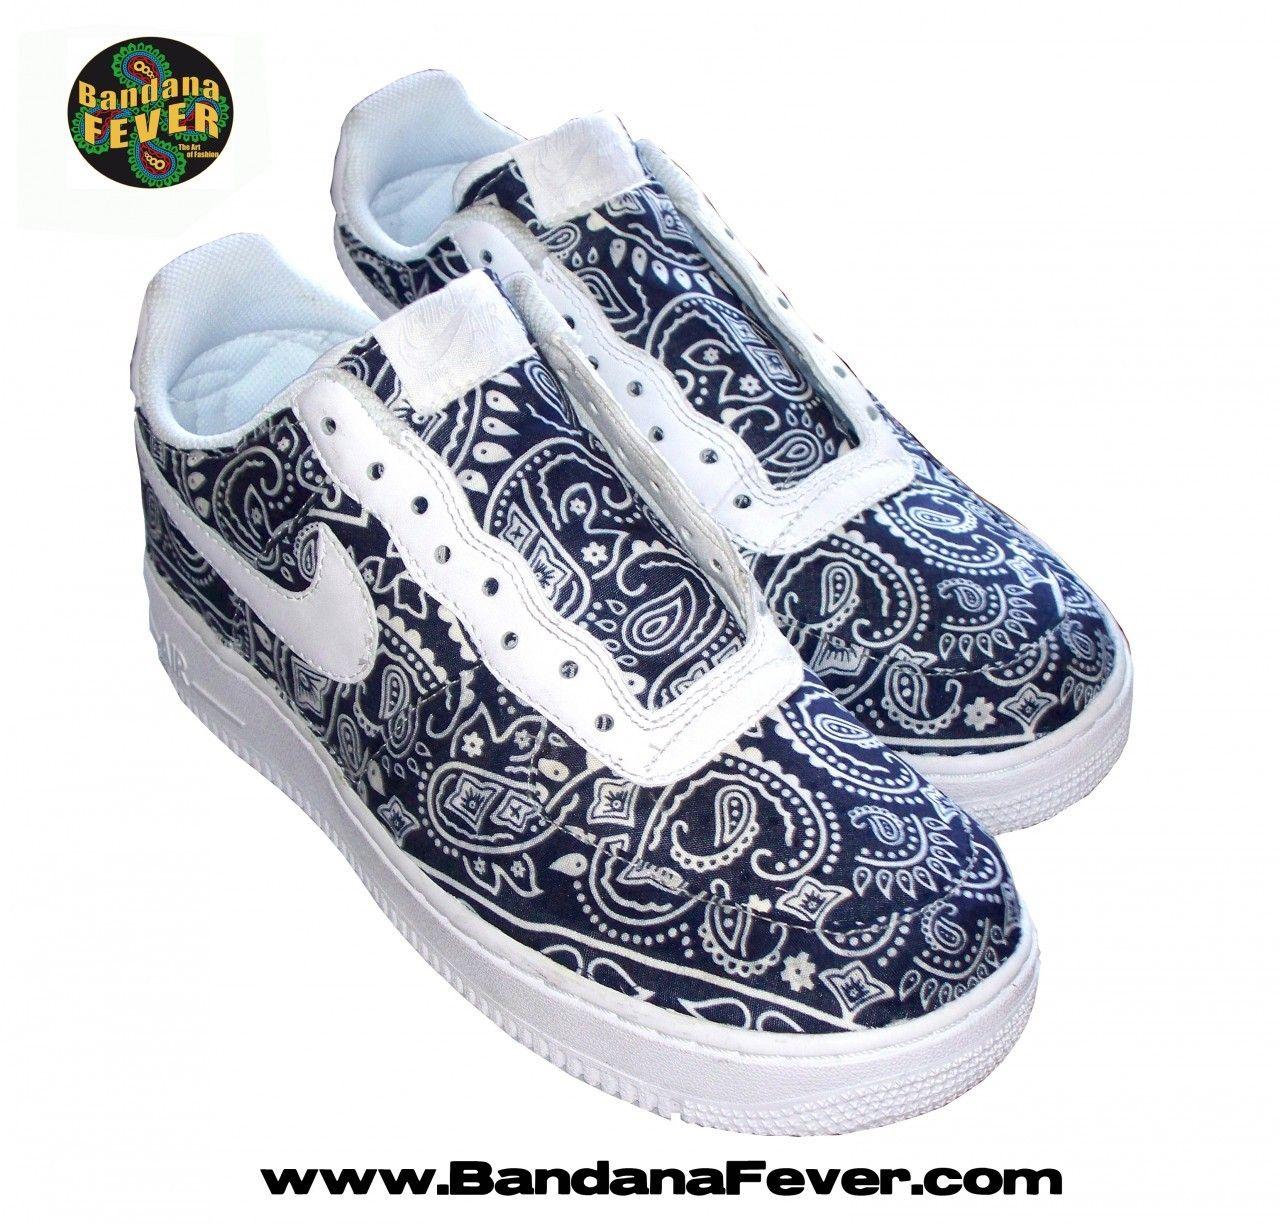 Bandana Fever Bandana Fever Custom Nike Air Force 1